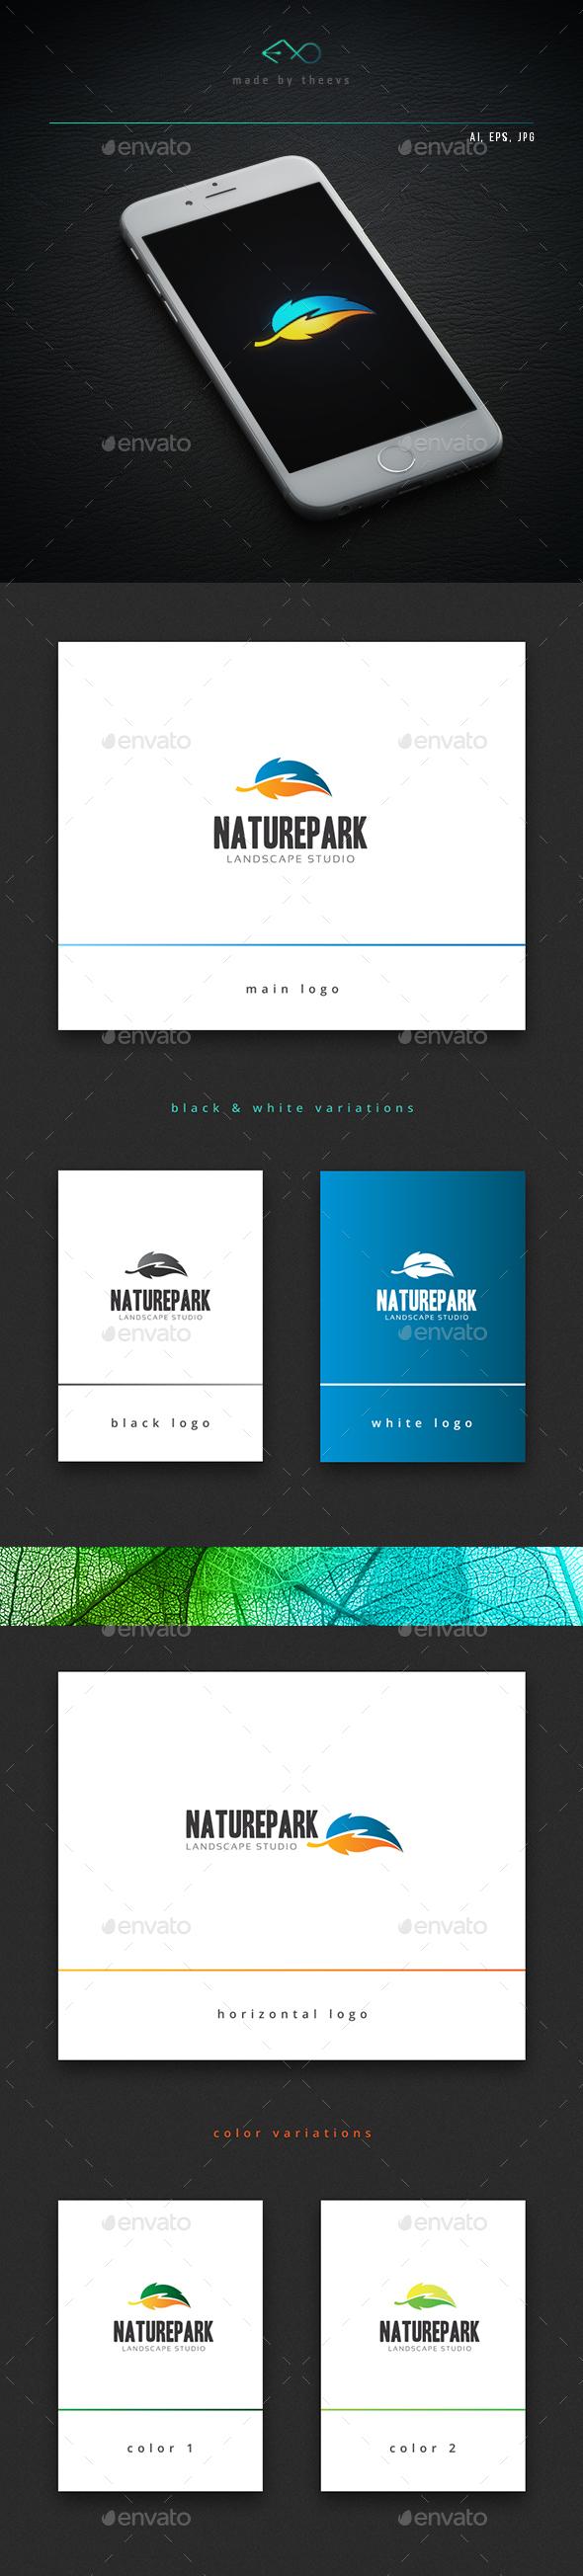 Naturepark - Nature Logo Templates